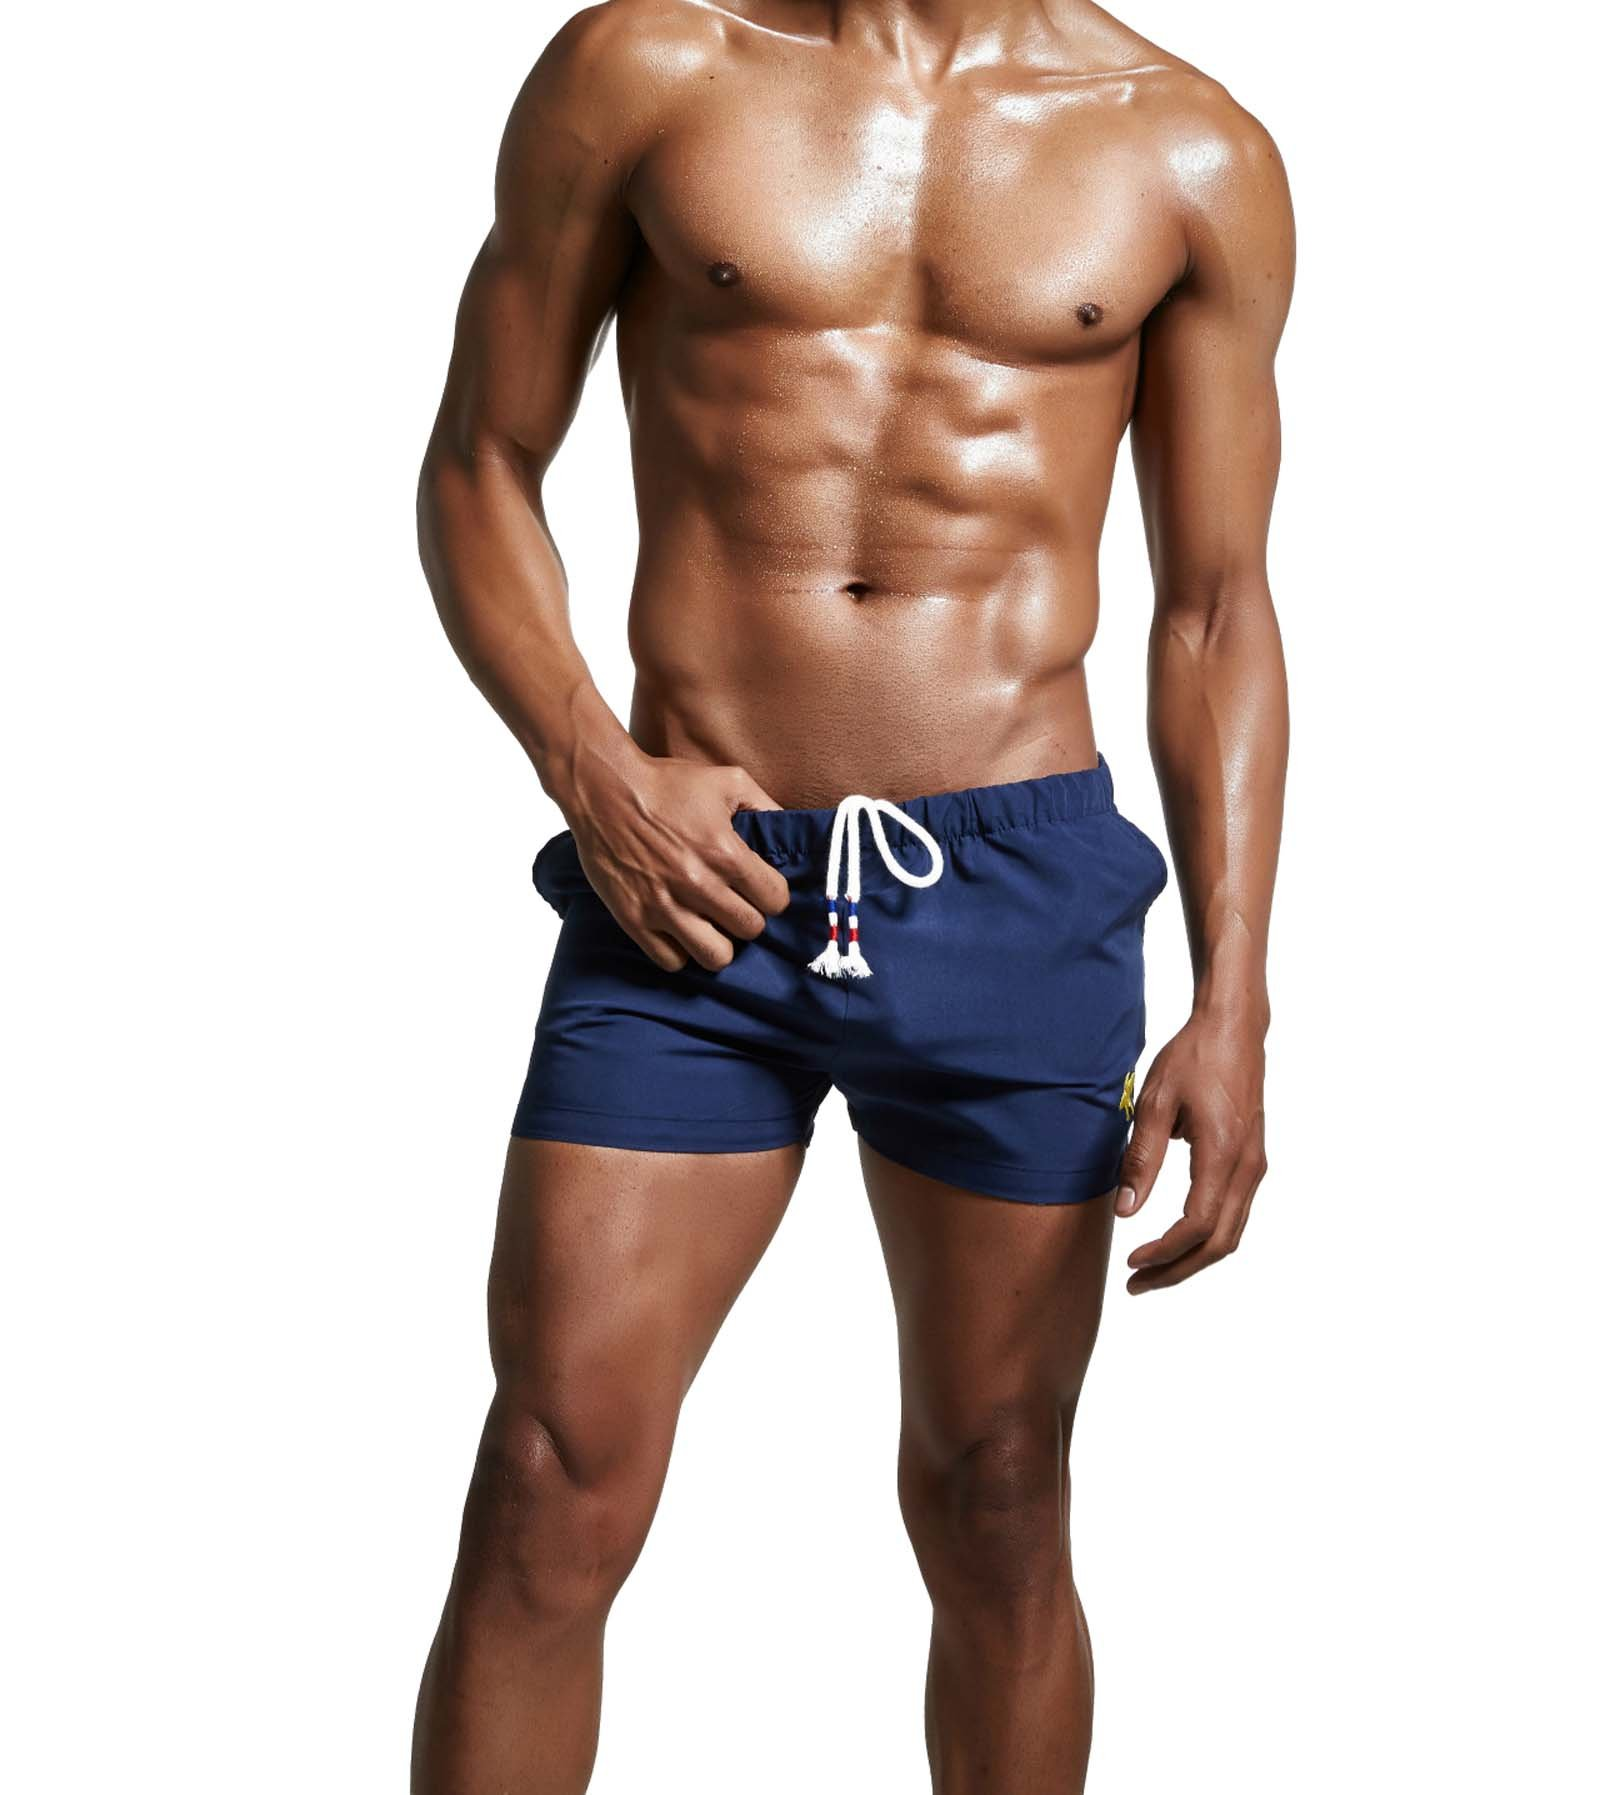 Mens Swimming Trunk Swim Briefs Boxer Short Bikini Swimwear Swimsuit for Men by Roti Garden (Image #1)